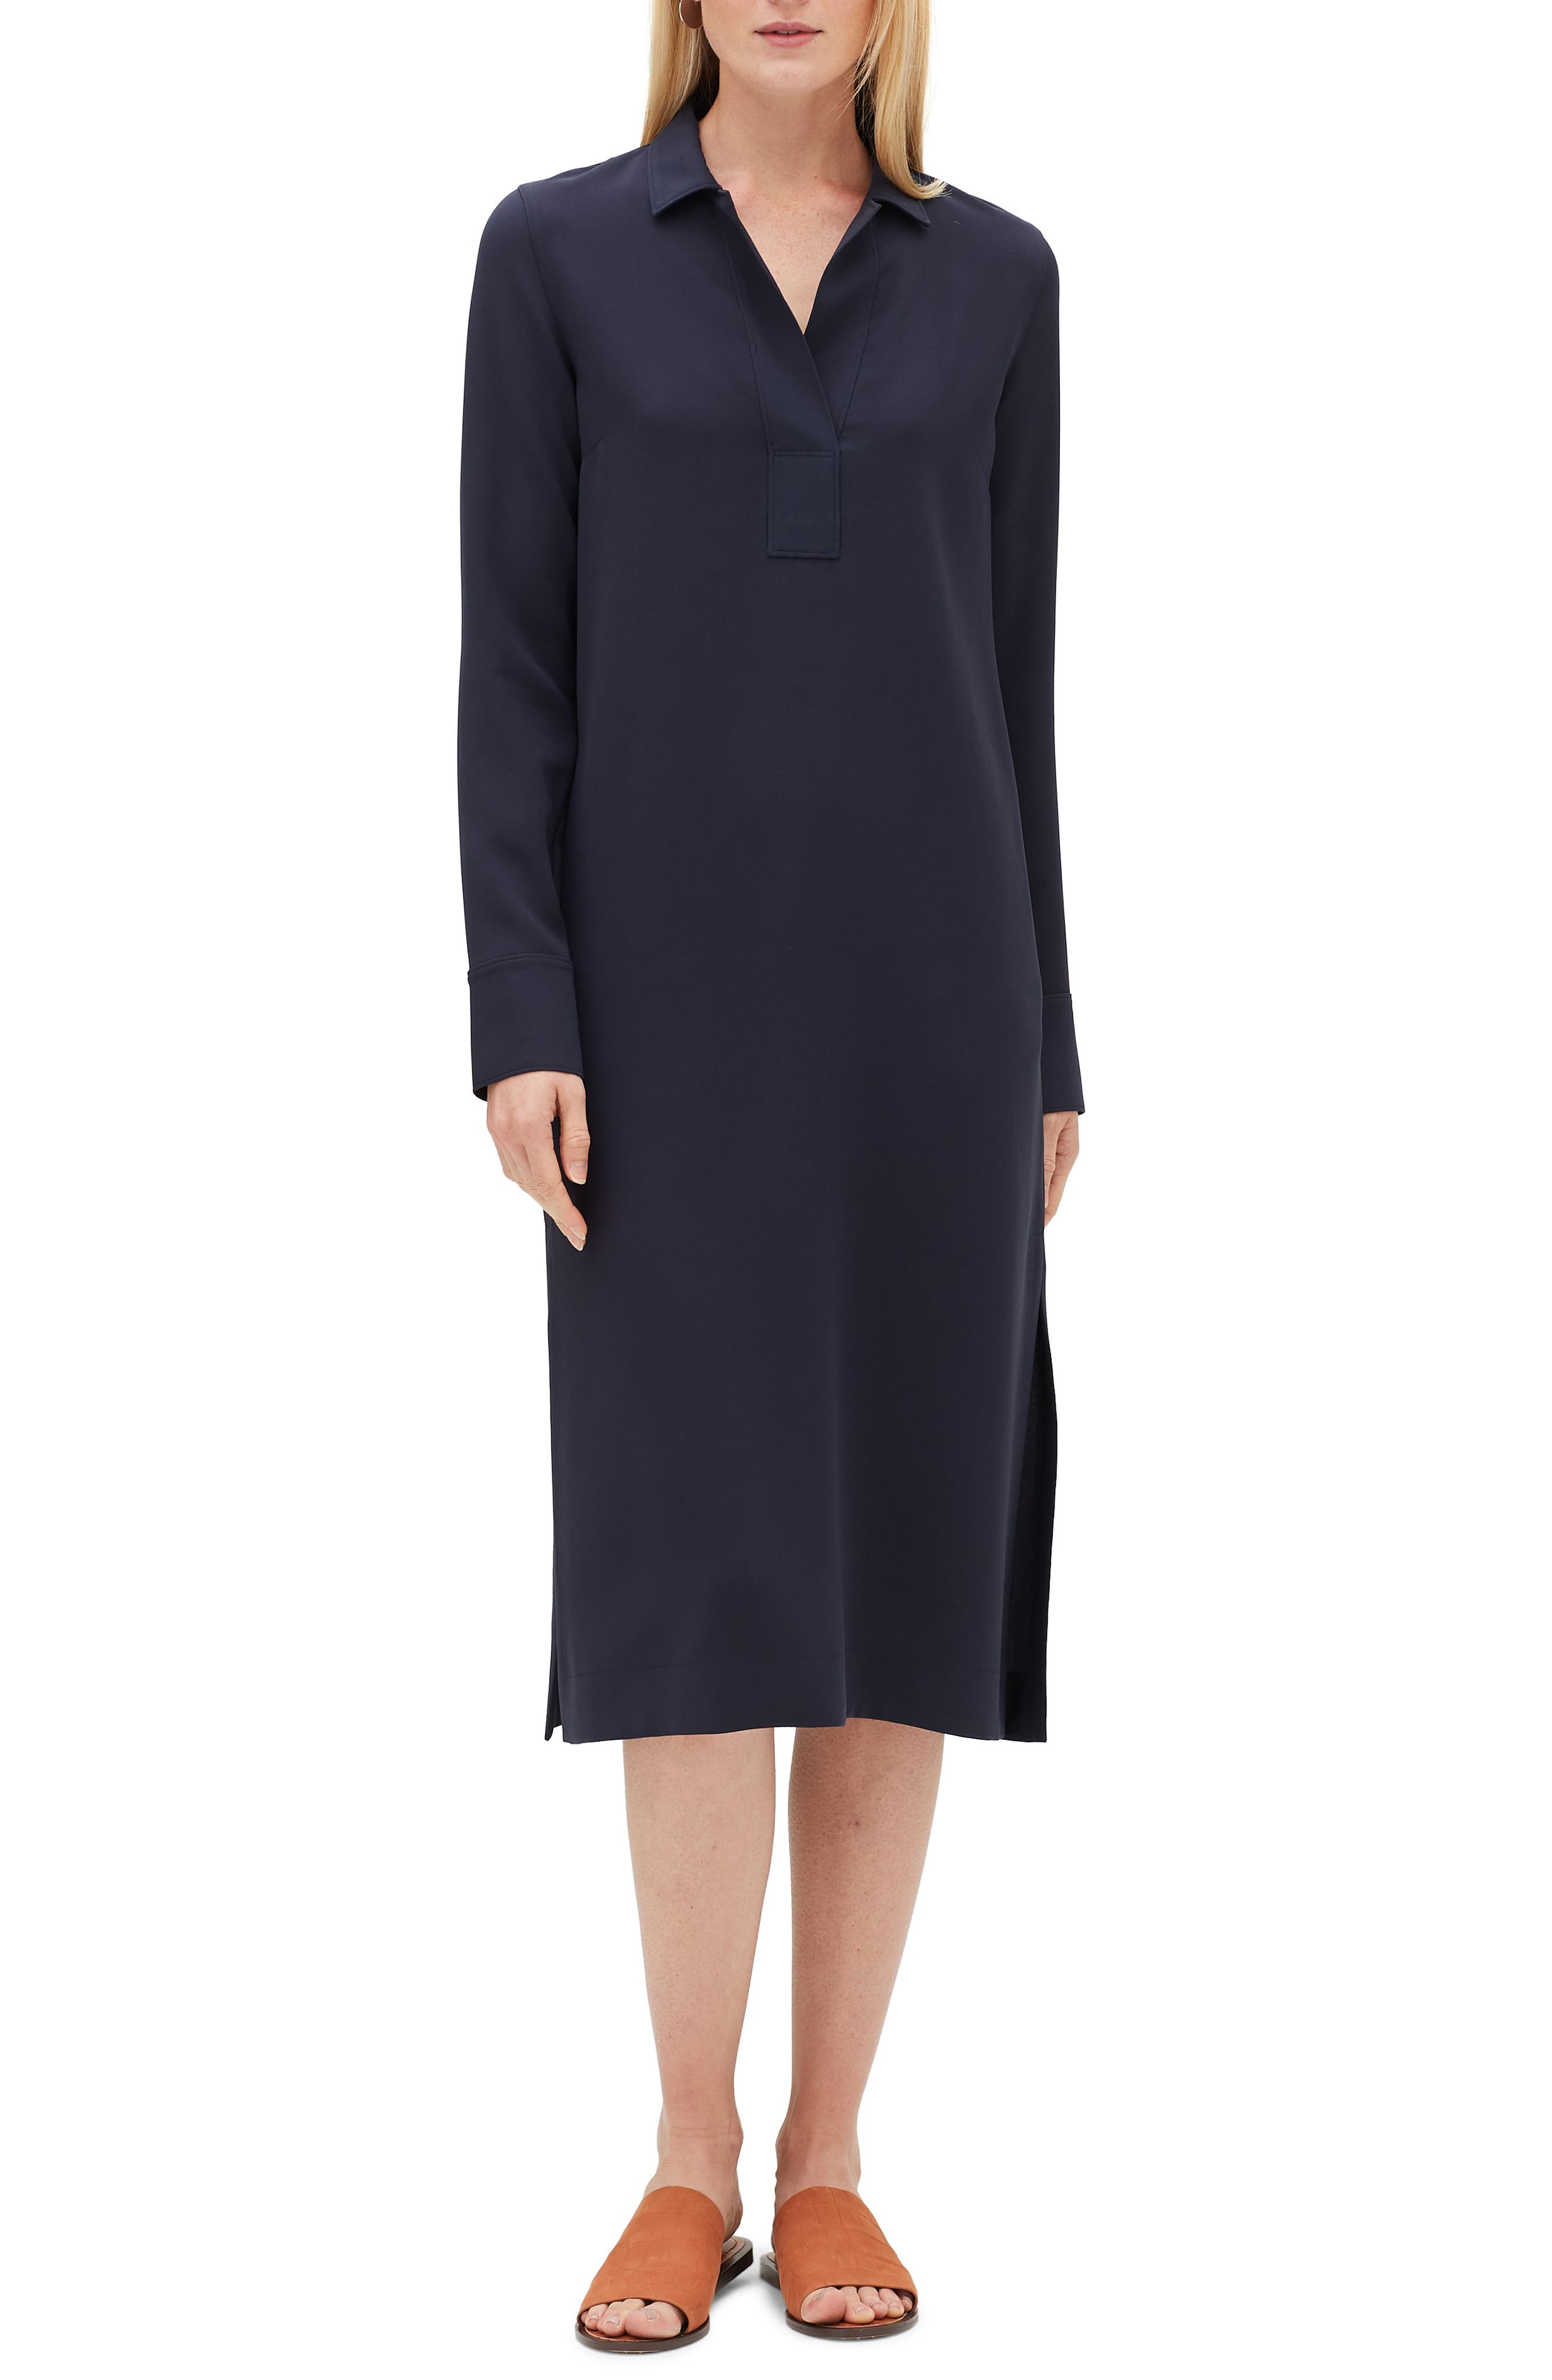 LAFAYETTE 148 HANSEL FINESSE CREPE DRESS